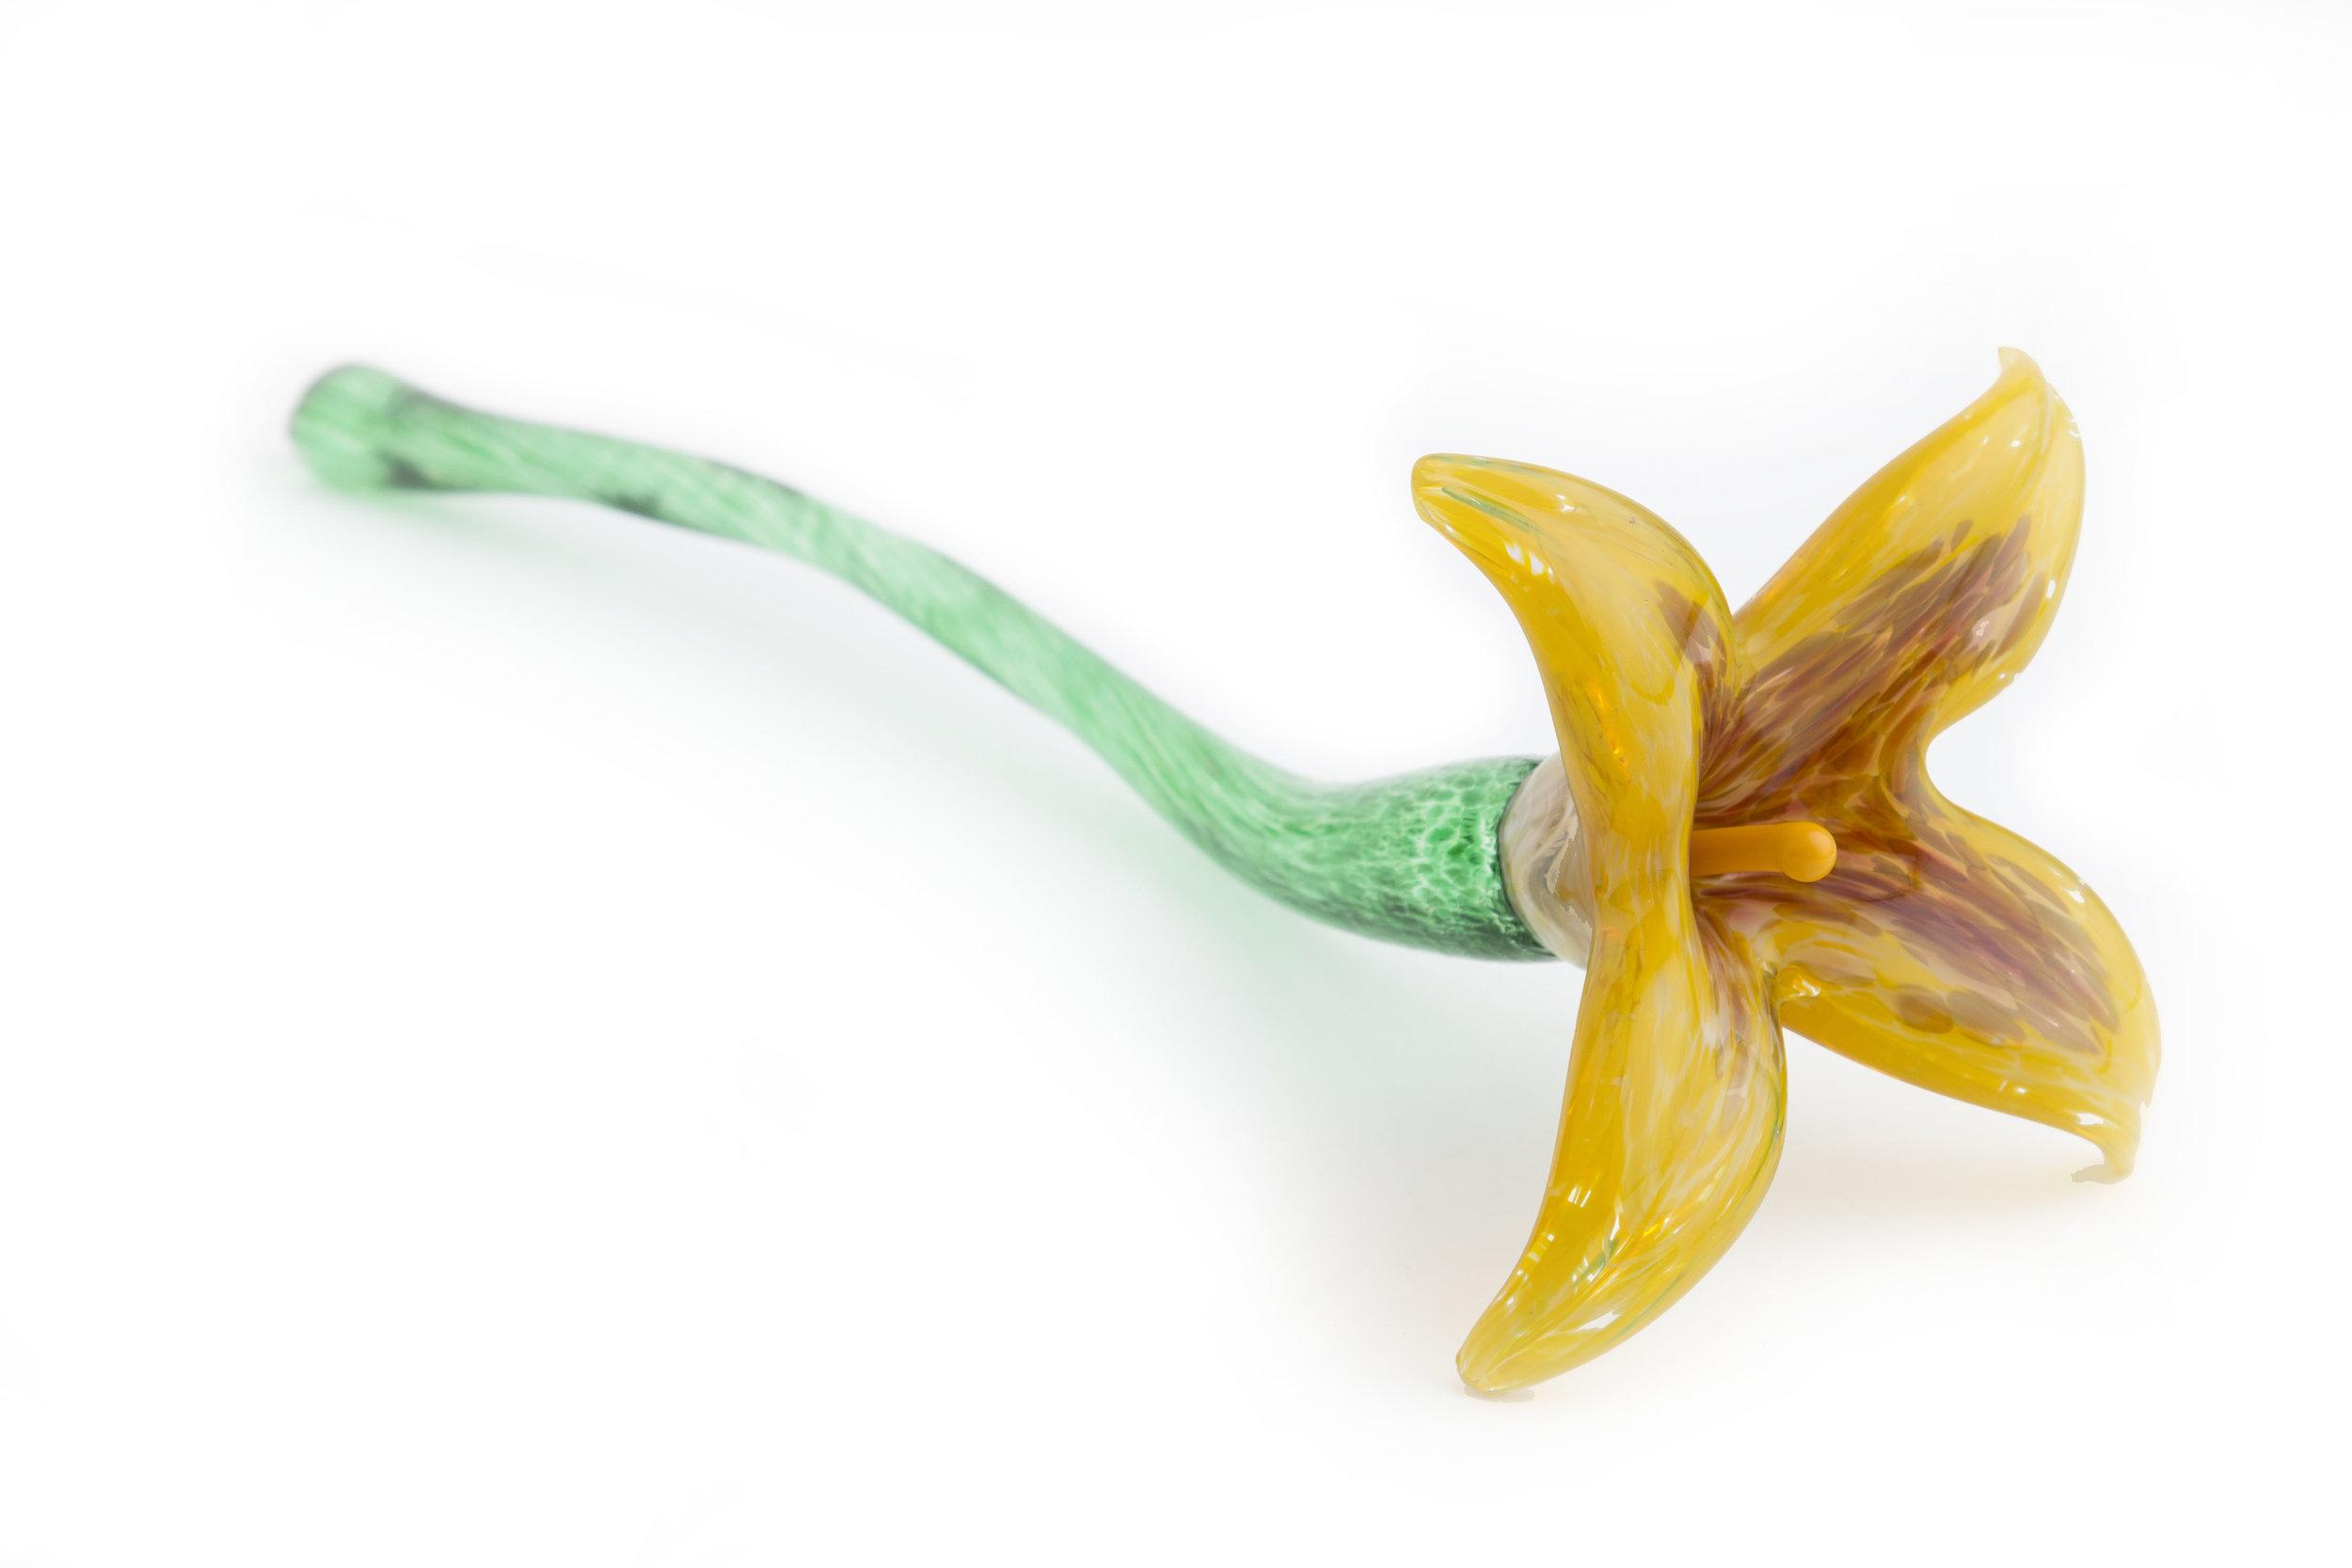 Holdman-Studios-advanced-glass-flower-class-experience-daylily-example.jpg